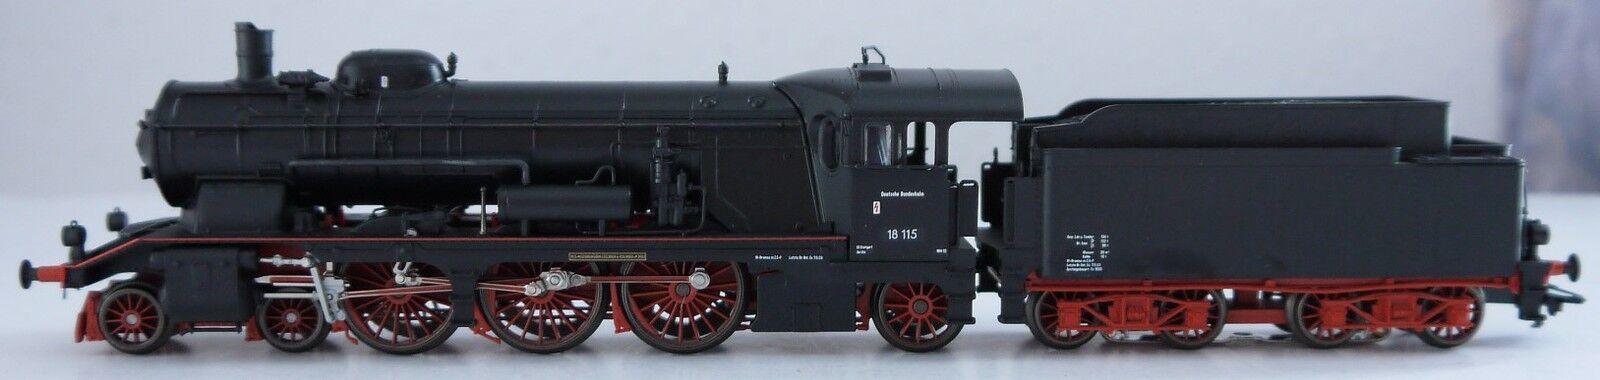 37115 locomotiva a vapore serie siano 18.115 - DIGITALE-Spur HO-CASSETTA LEGNO